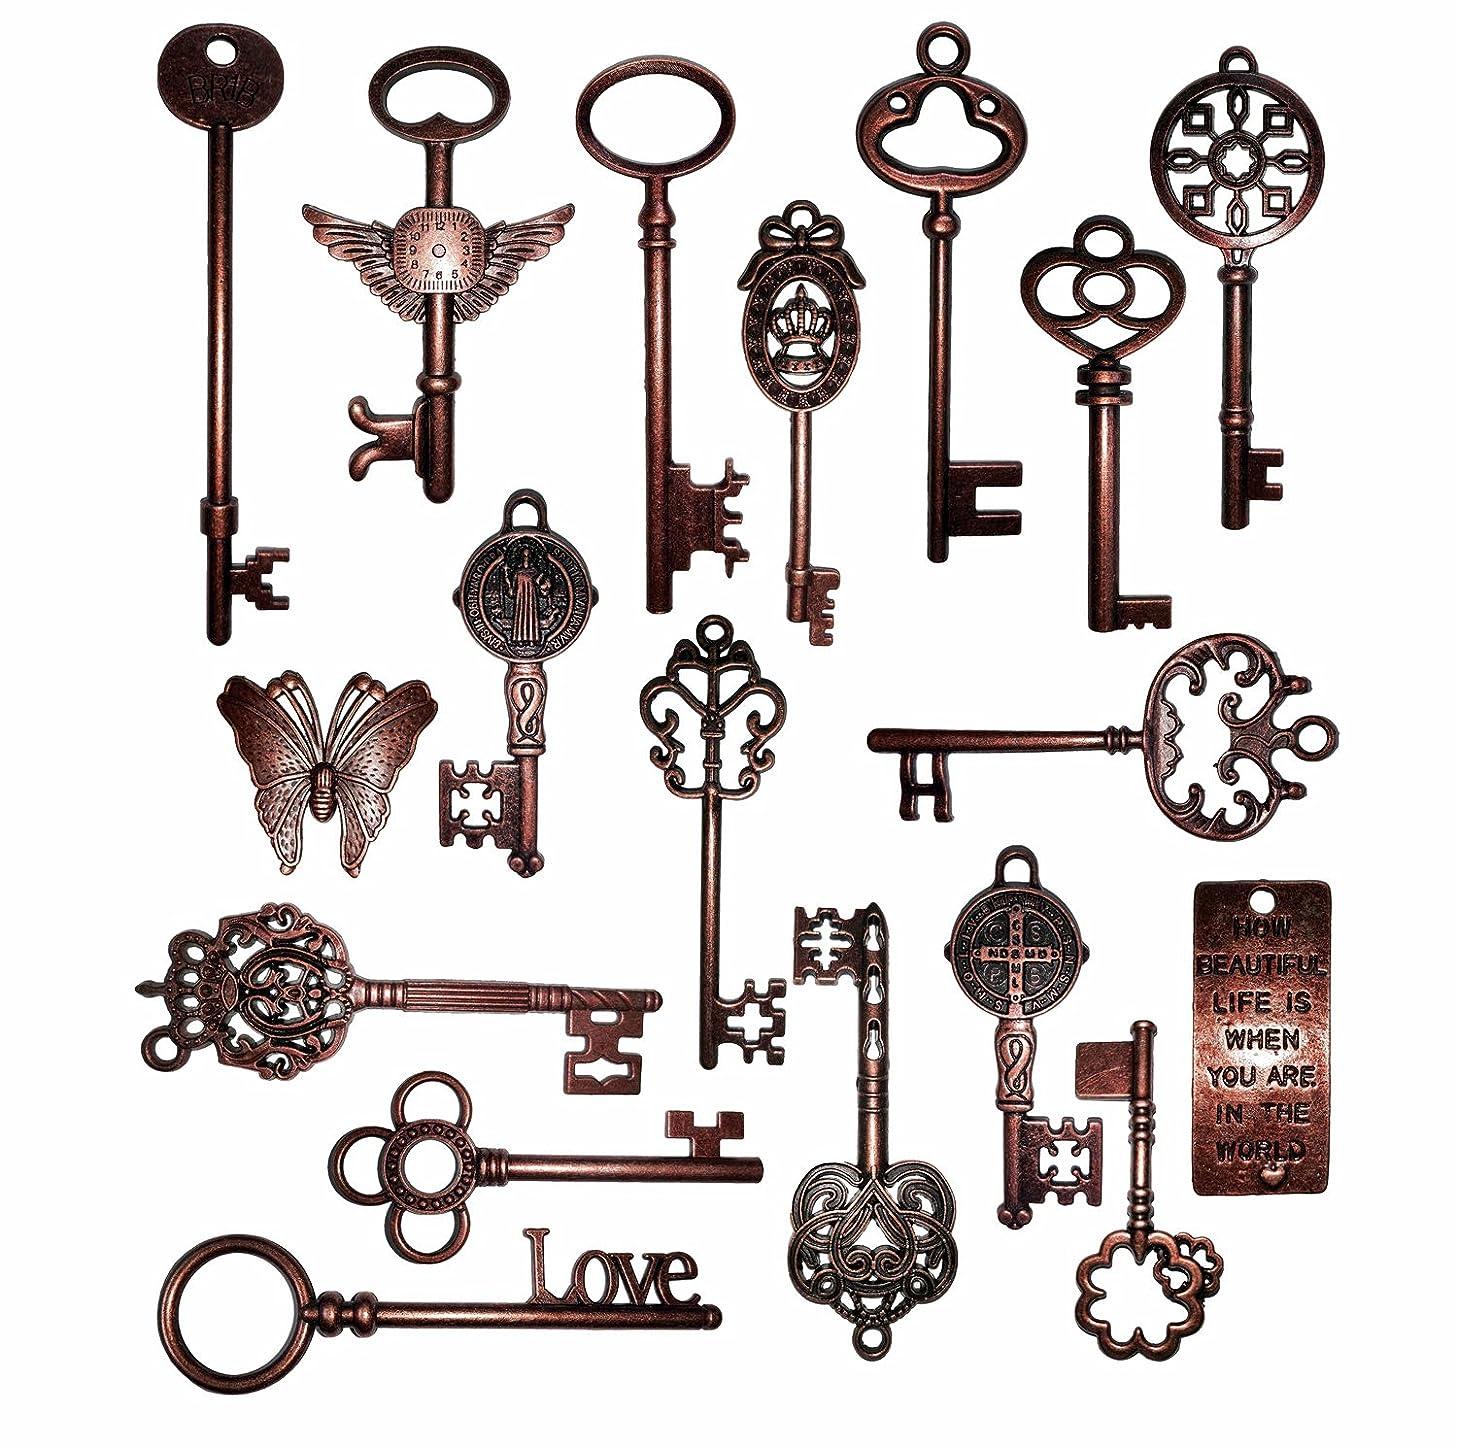 Vintage Skeleton Keys Charm Set in Antique Copper Pack of 18 Keys, 18 Different Style, No Repeat (Copper)